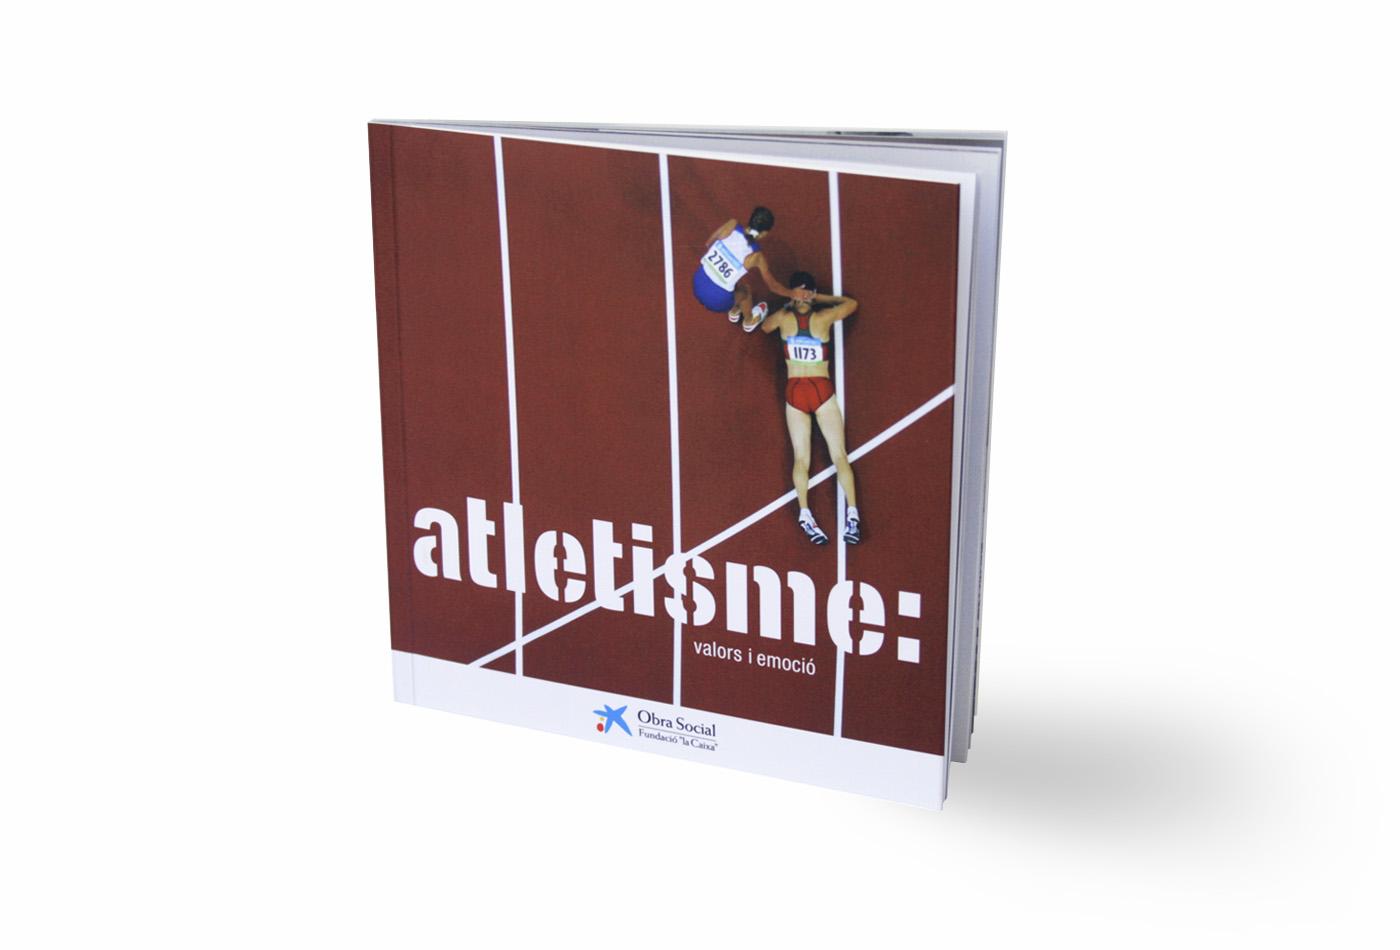 caixaforum-barcelona-catalogo-atletisme